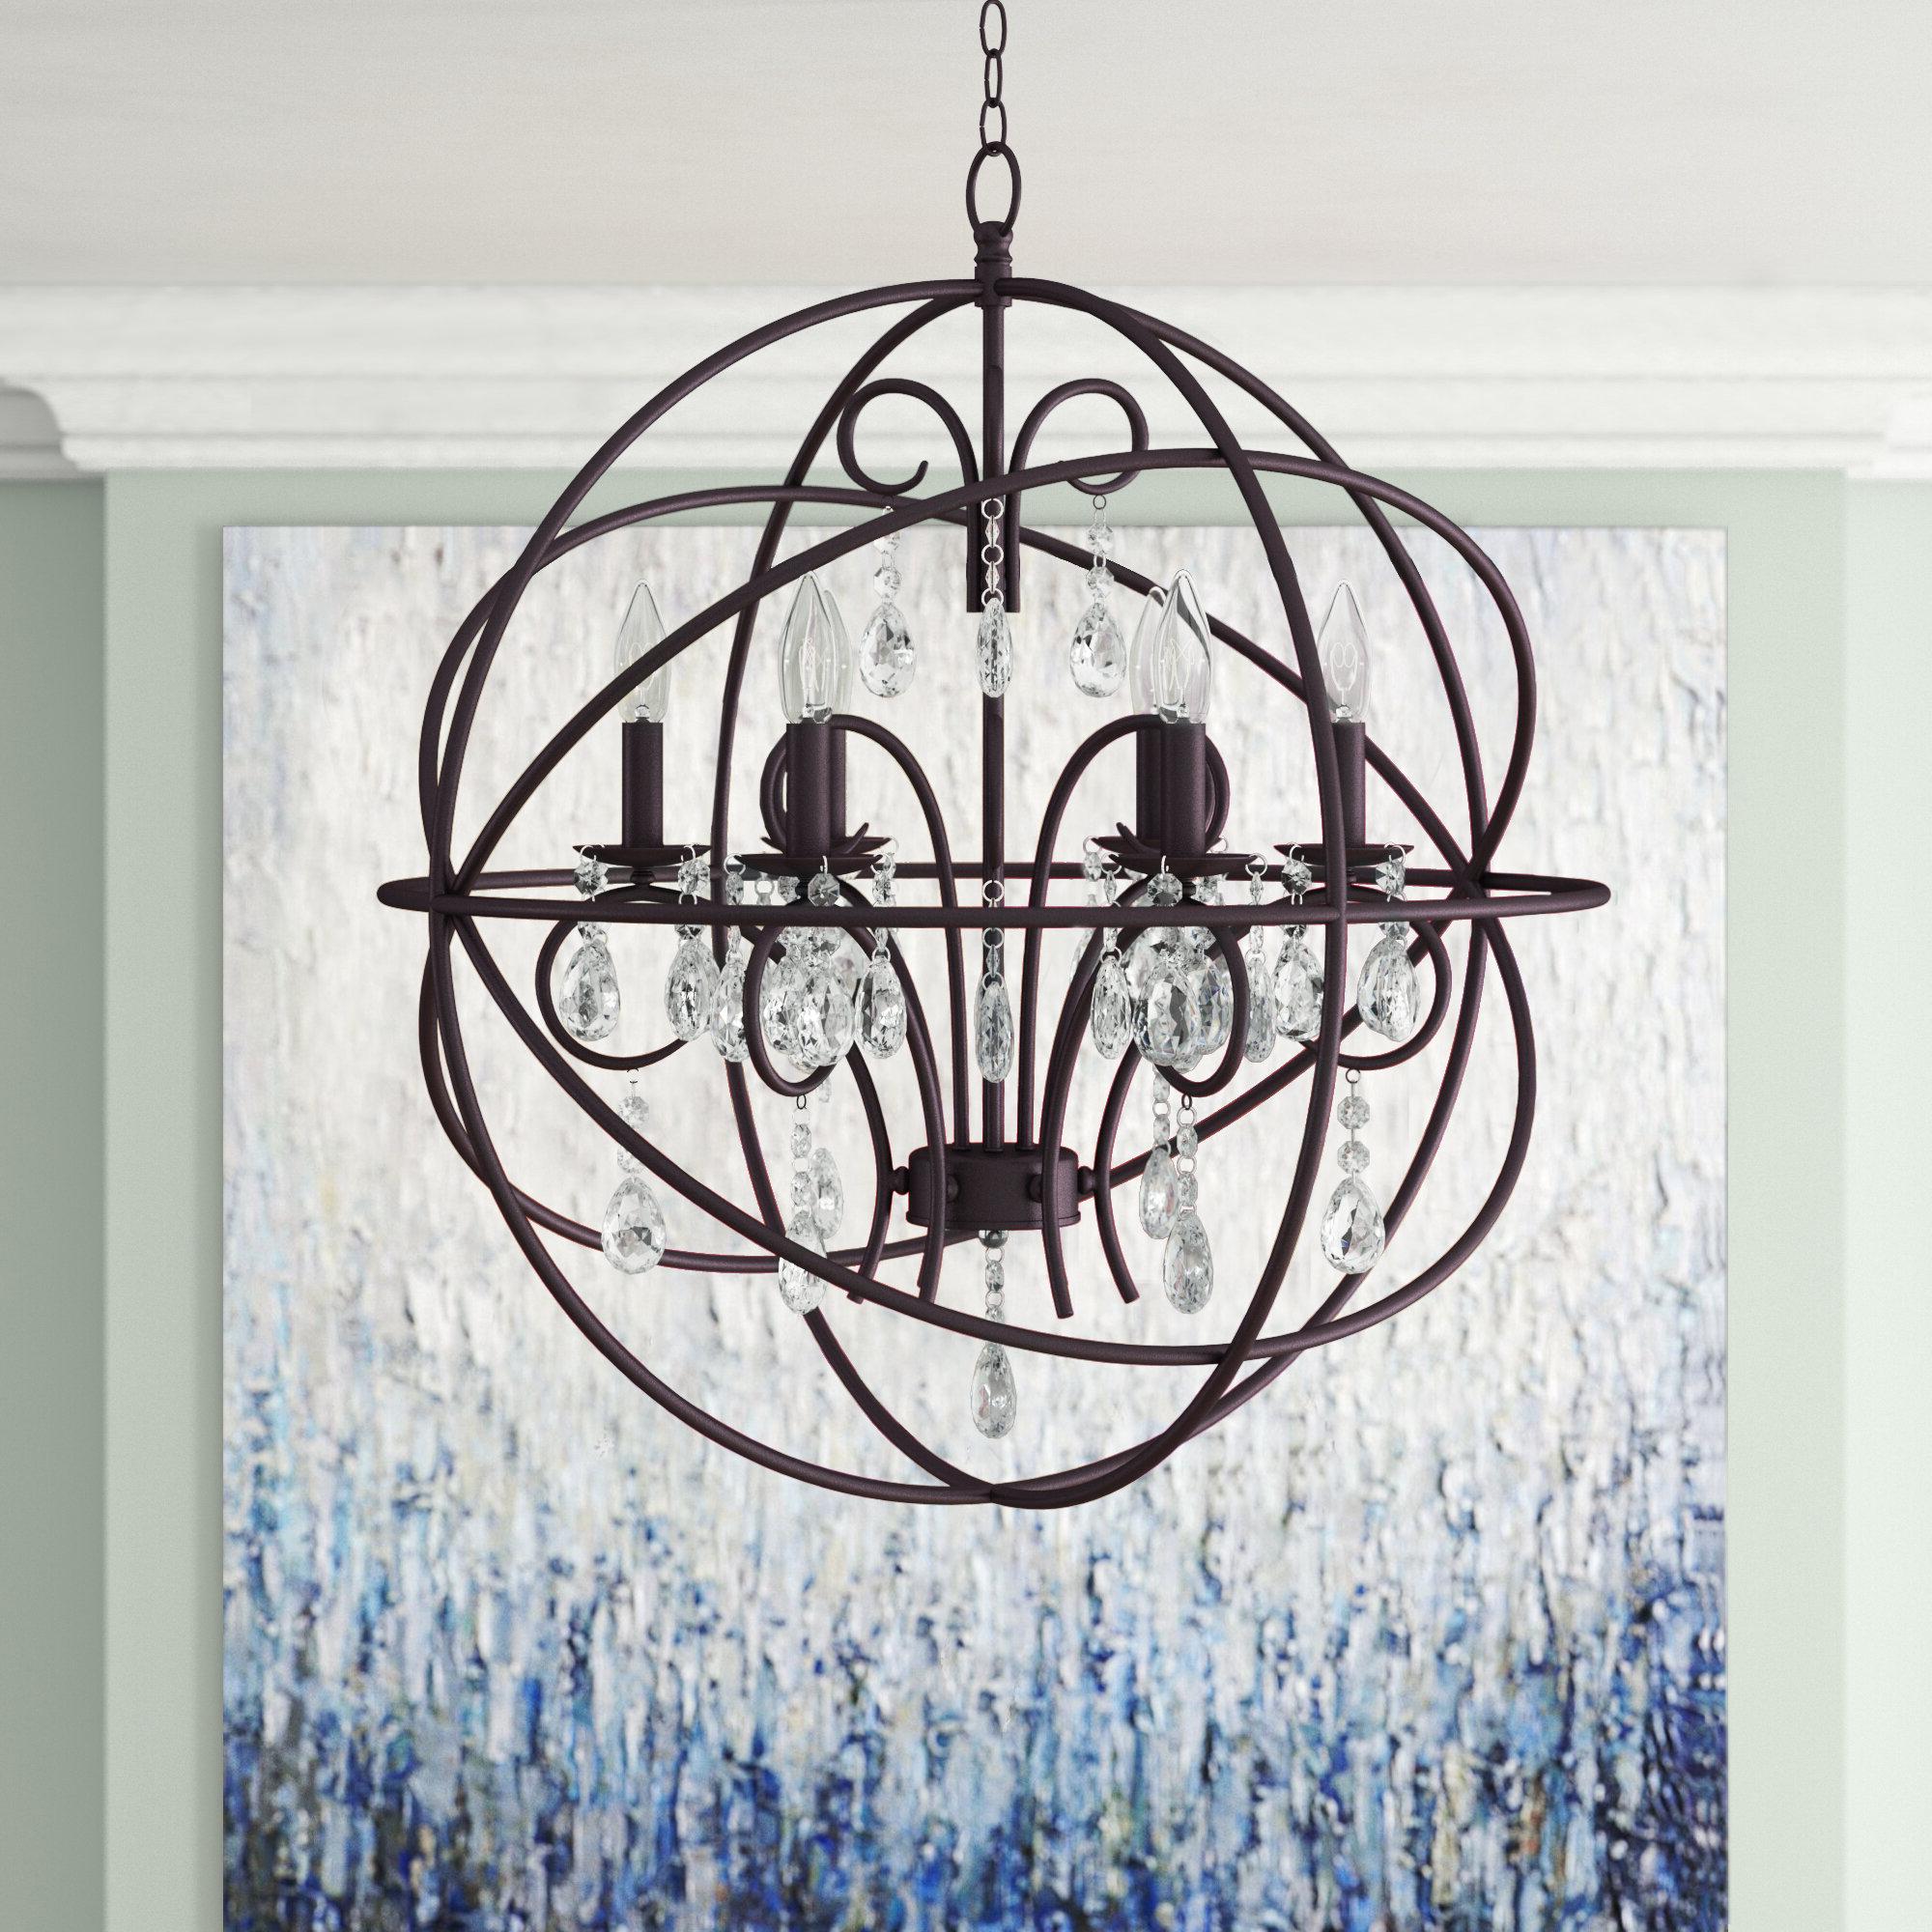 Most Current Willa Arlo Interiors Alden 6 Light Globe Chandelier In Eastbourne 6 Light Unique / Statement Chandeliers (View 12 of 25)